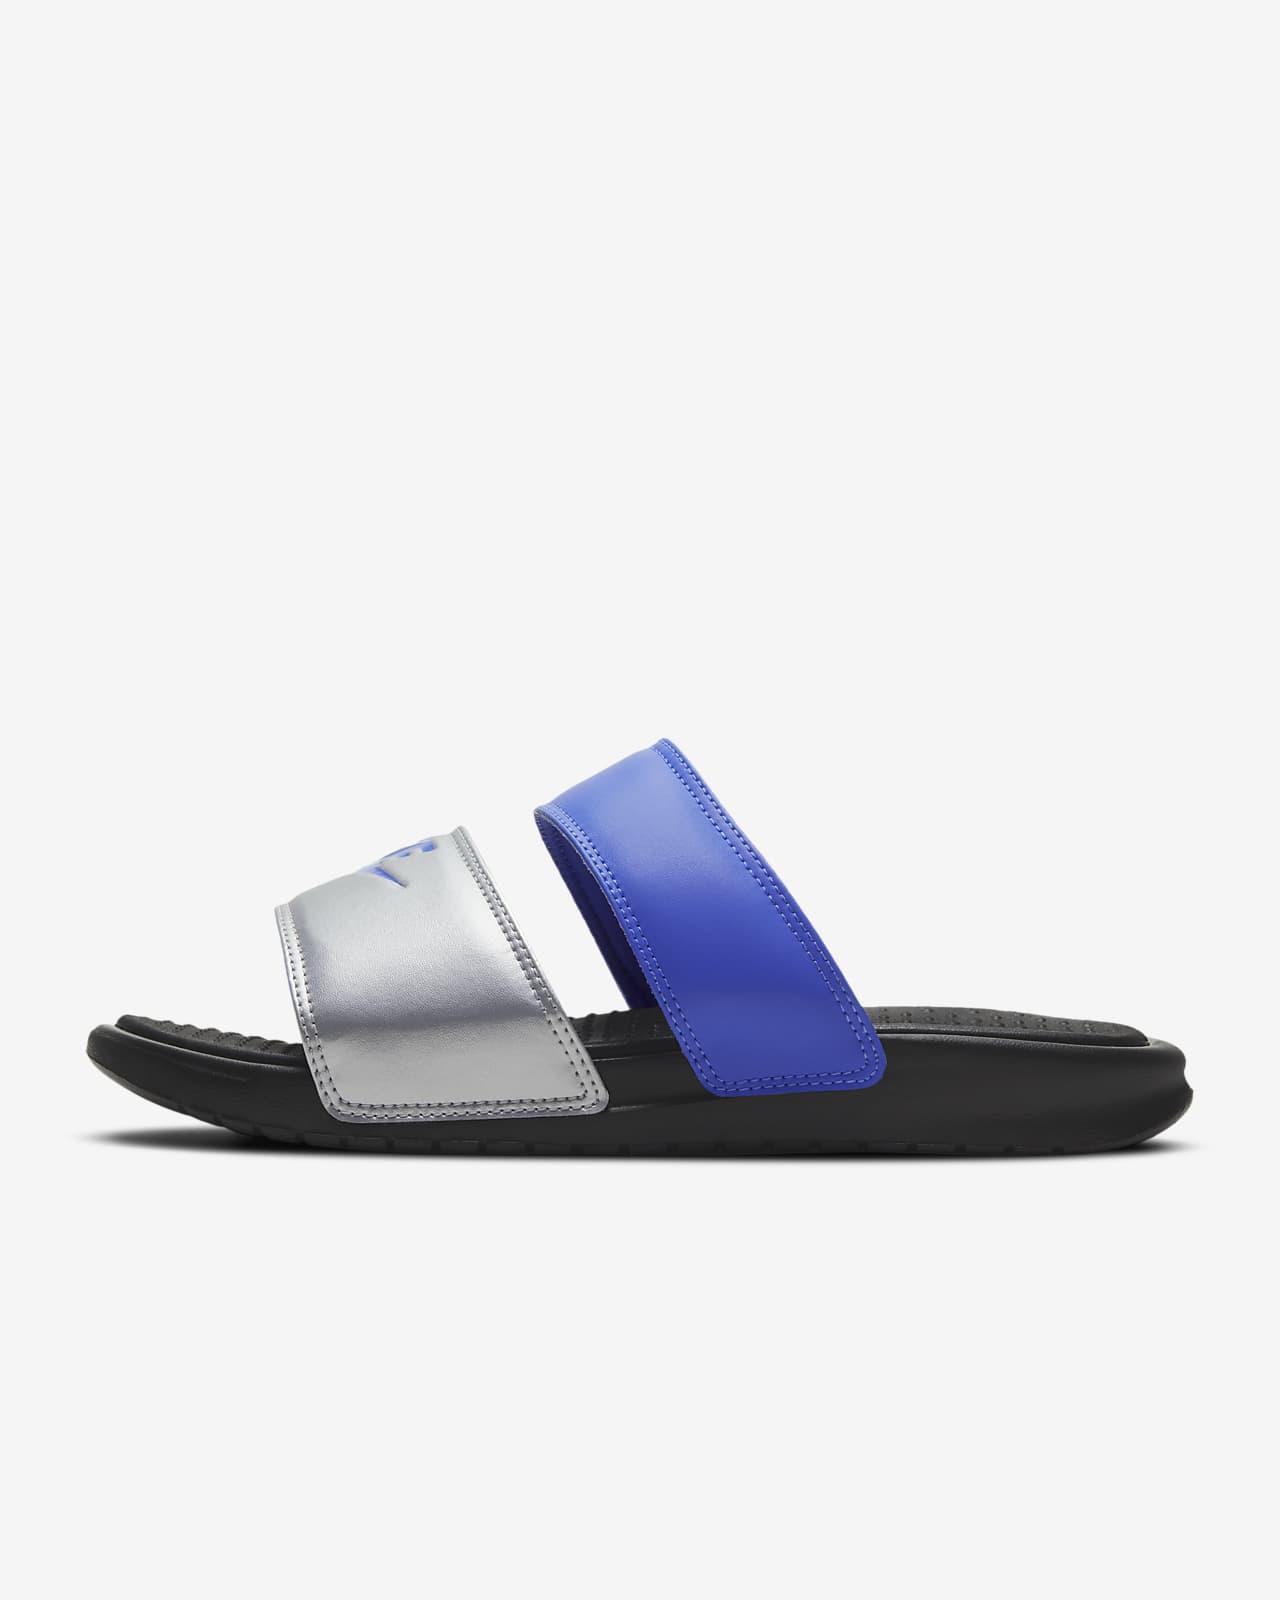 Nike Benassi Duo Ultra Women's Slides